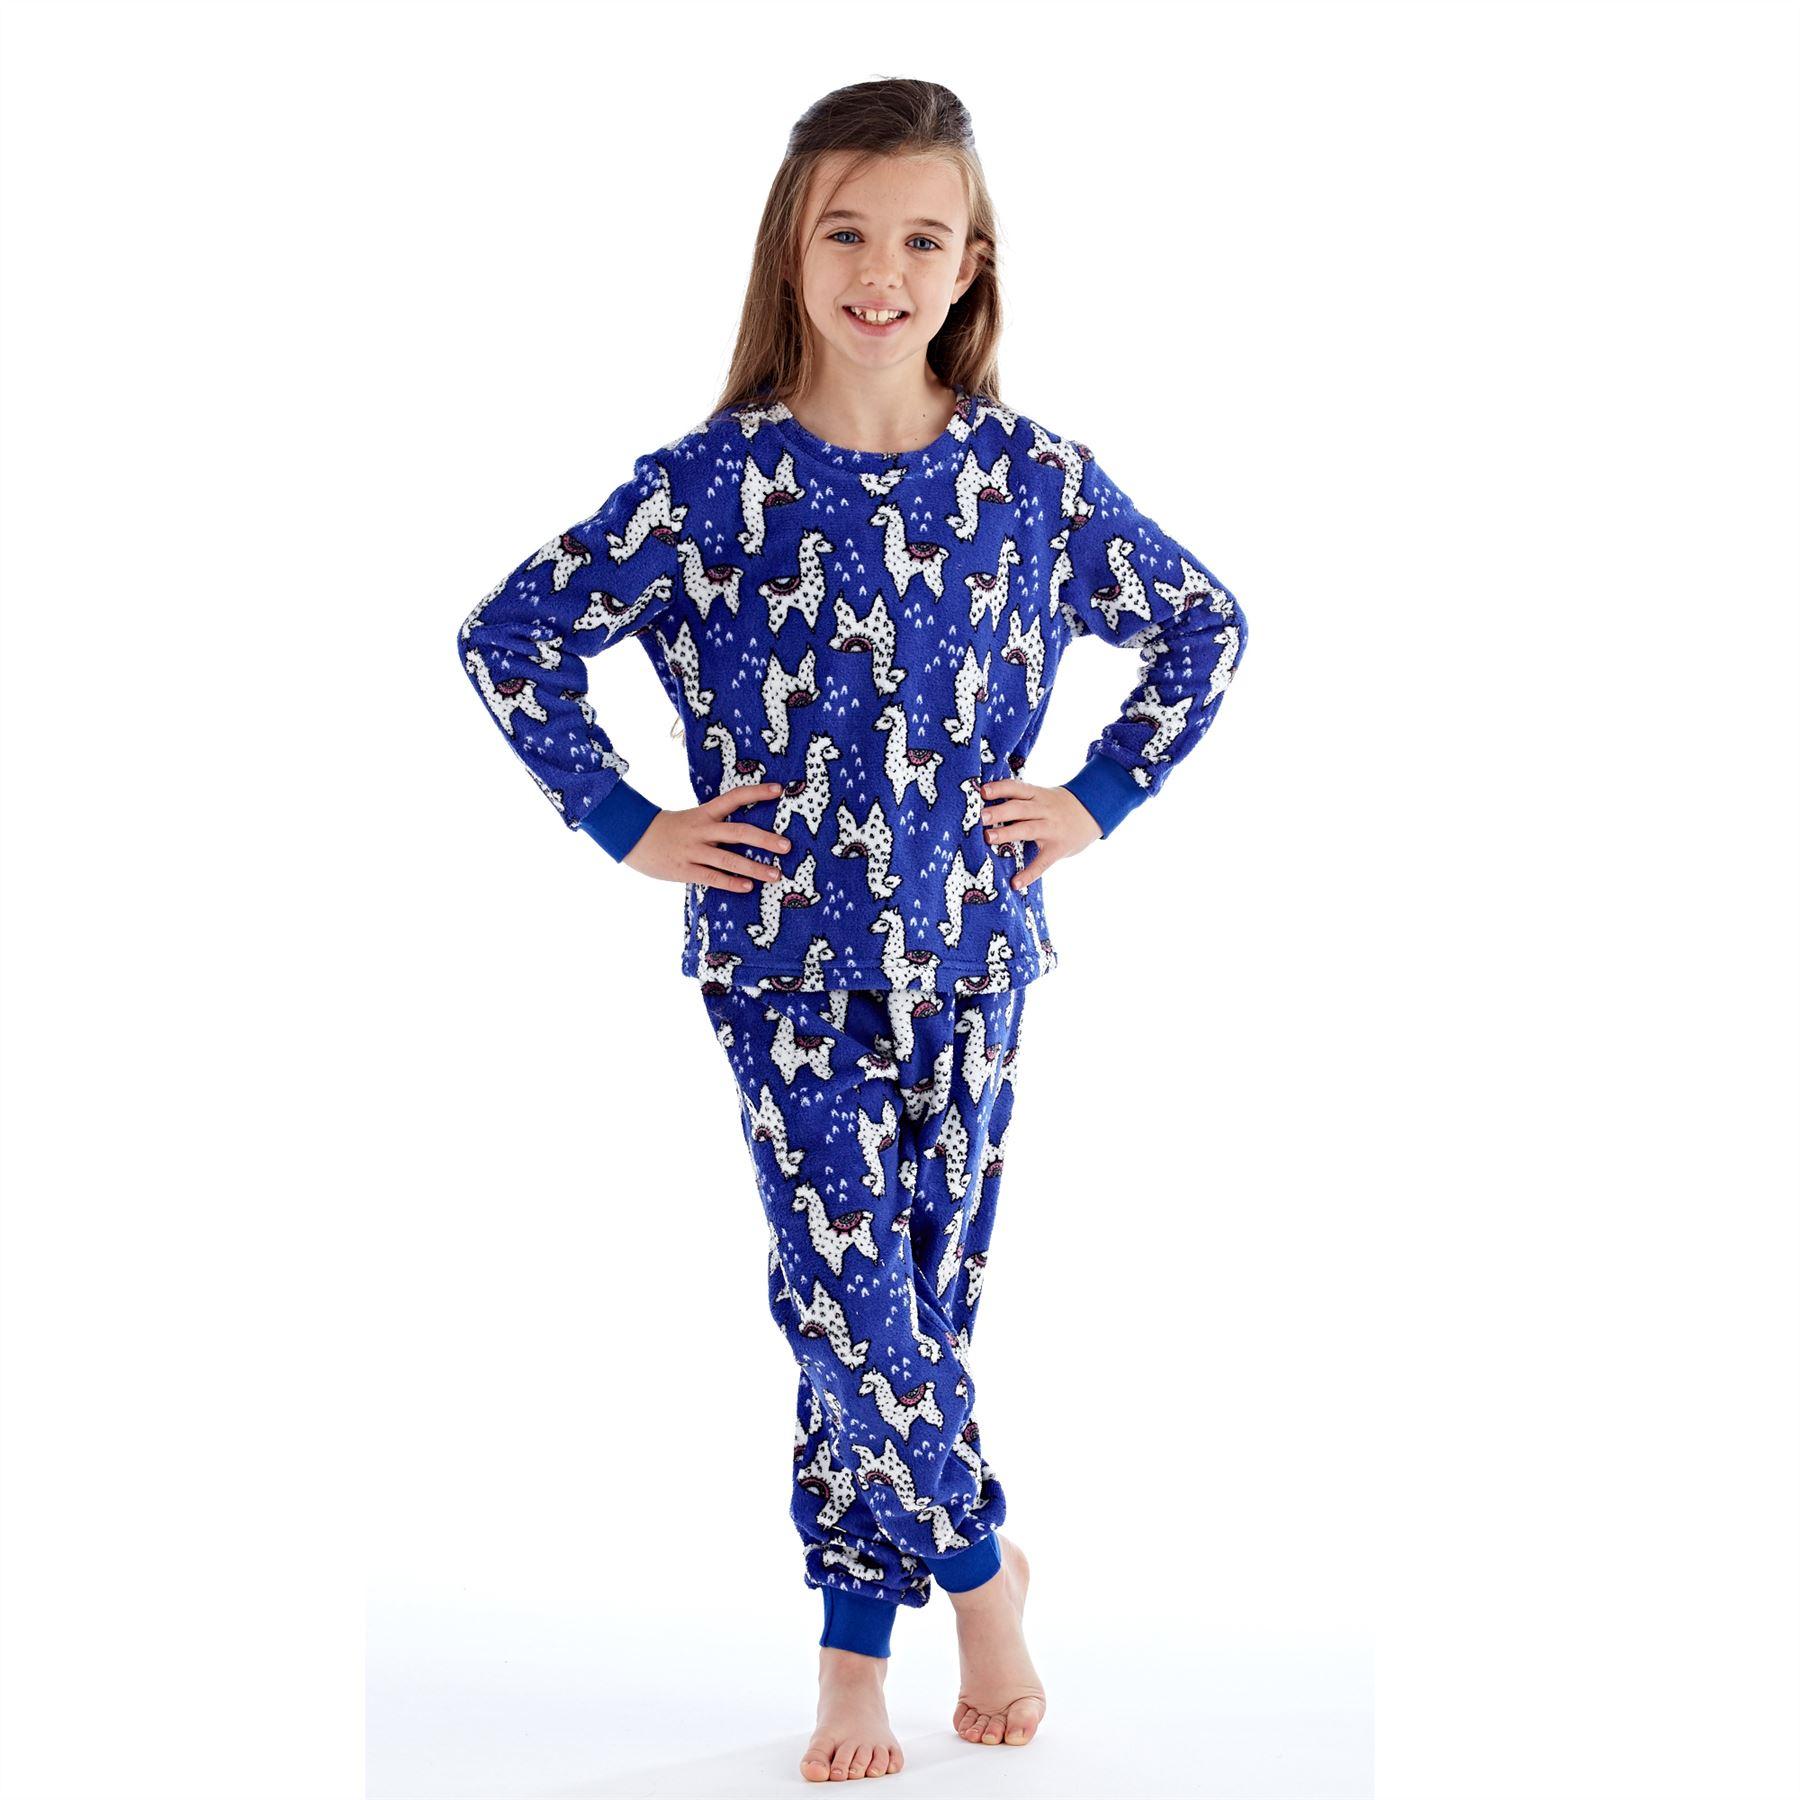 Girls-Boys-Fleece-Pyjamas-Childrens-Pyjama-Set-Kids-PJs-Age-2-13-Years thumbnail 10